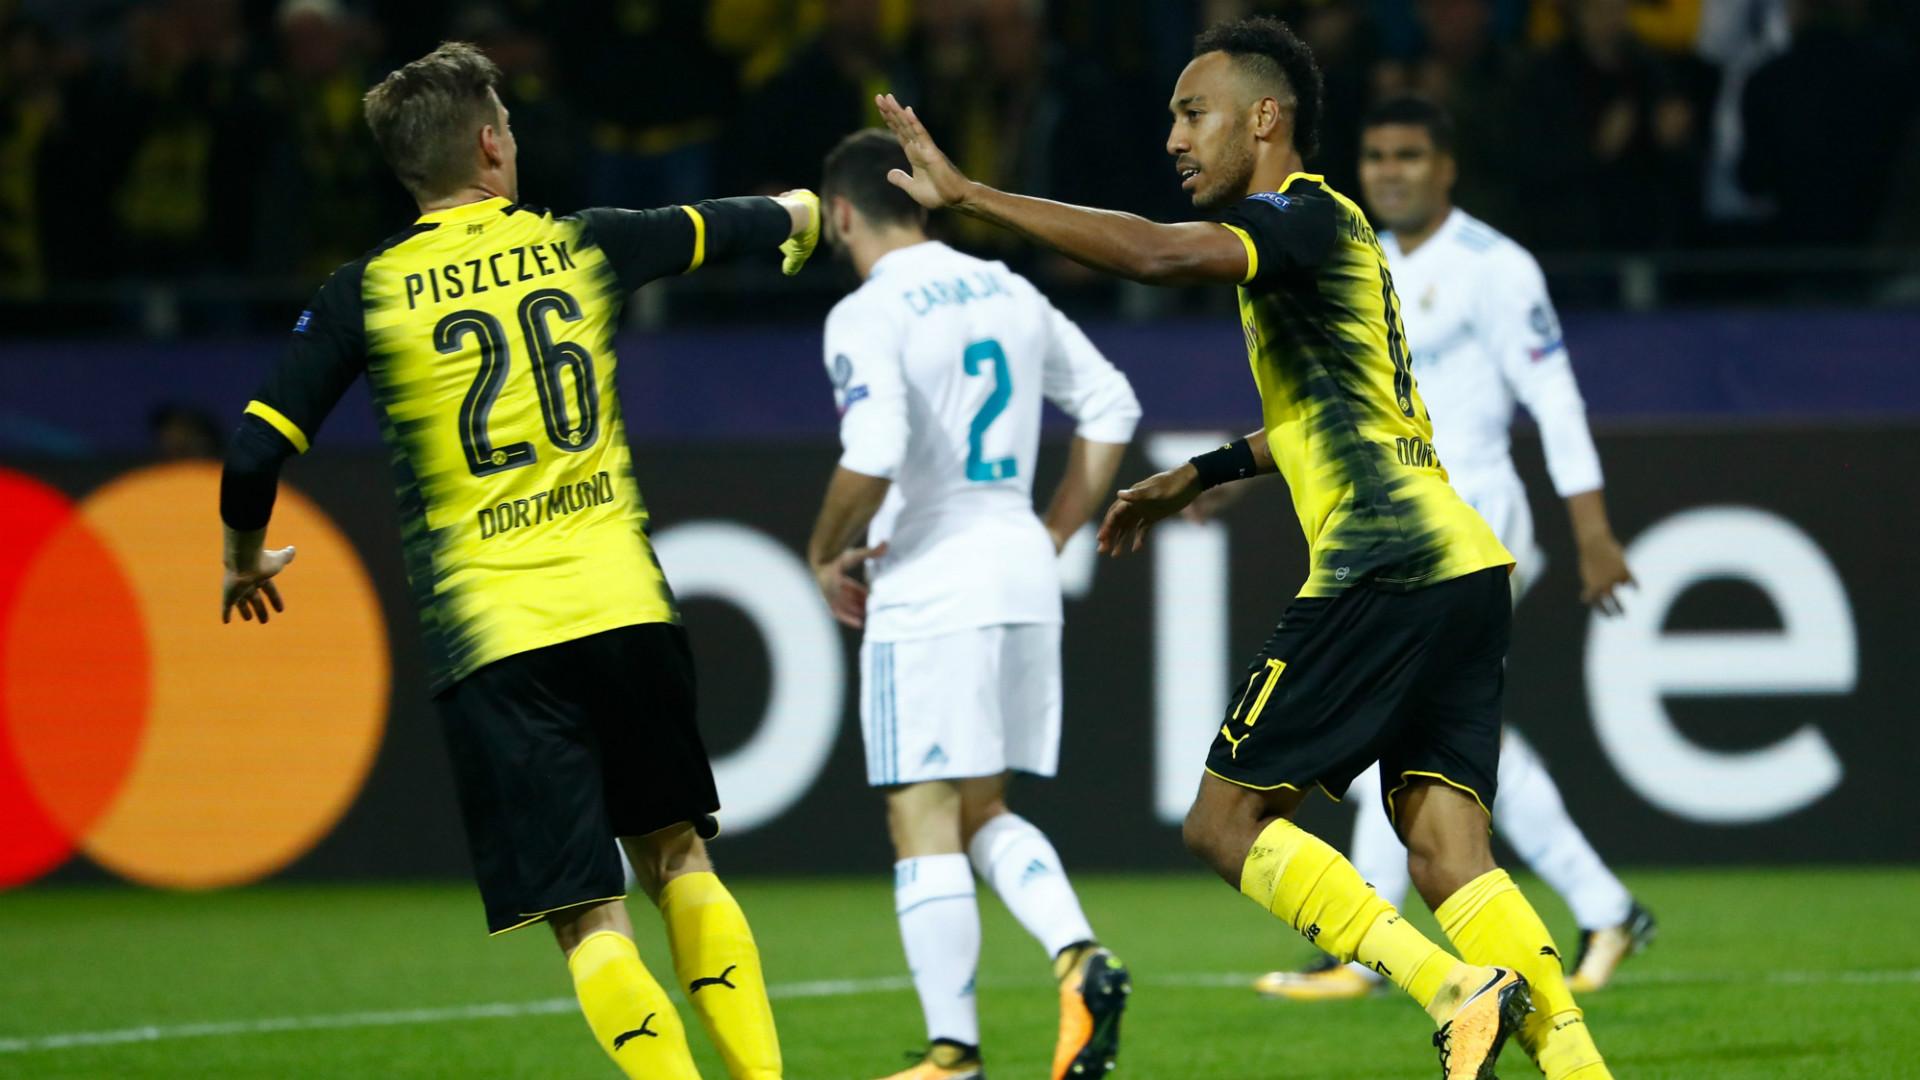 Pierre Emerick Aubameyang Lukasz Piszczek Borussia Dortmund Real Madrid Champions League 26092017